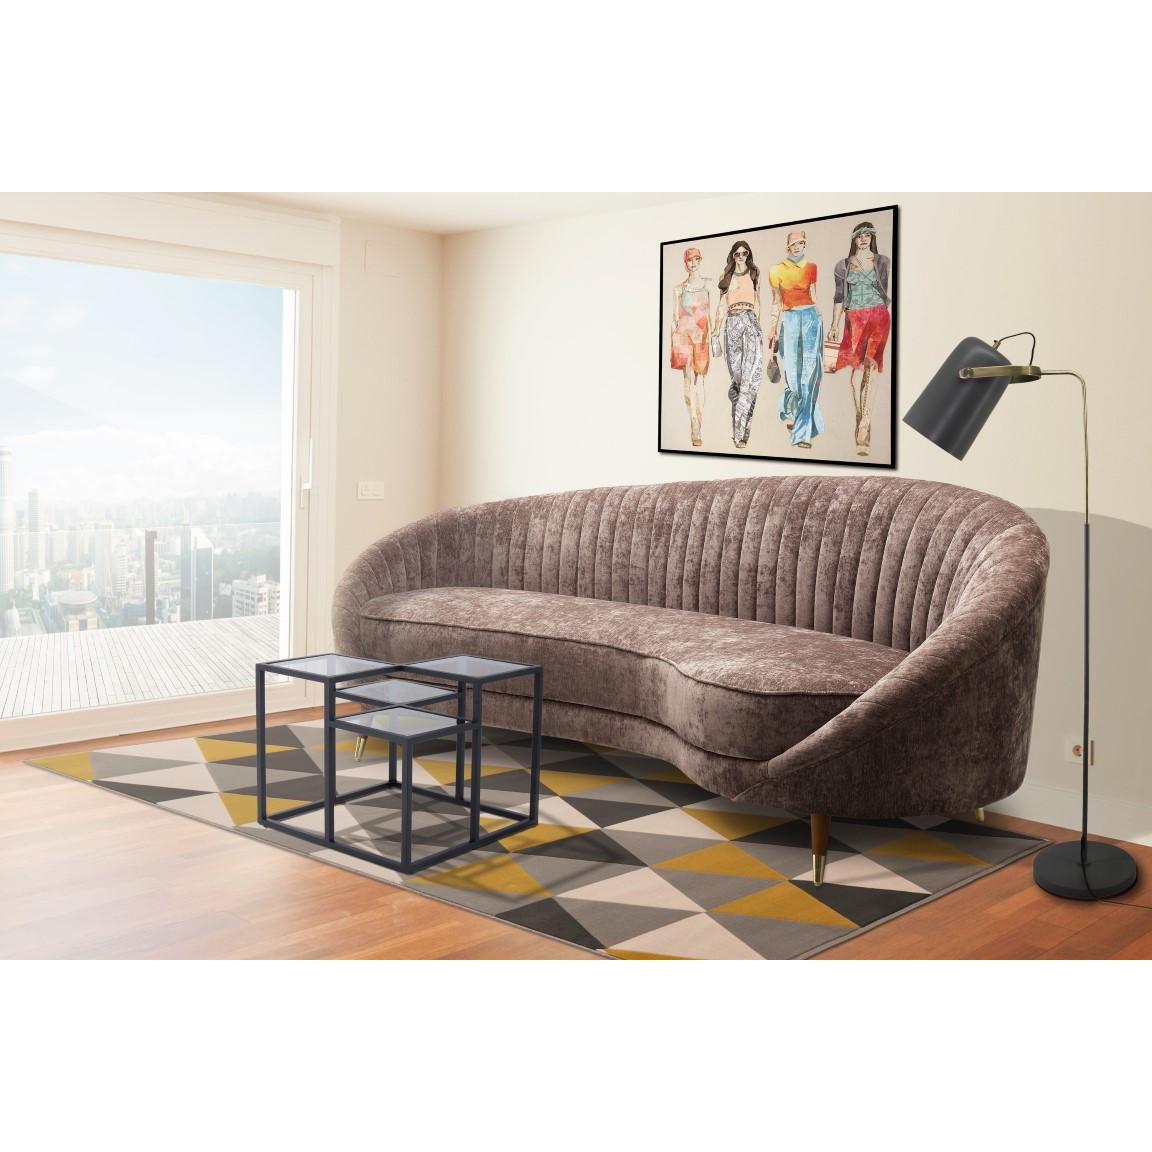 3-Sitzer-Sofa Caesar 333 | Braun